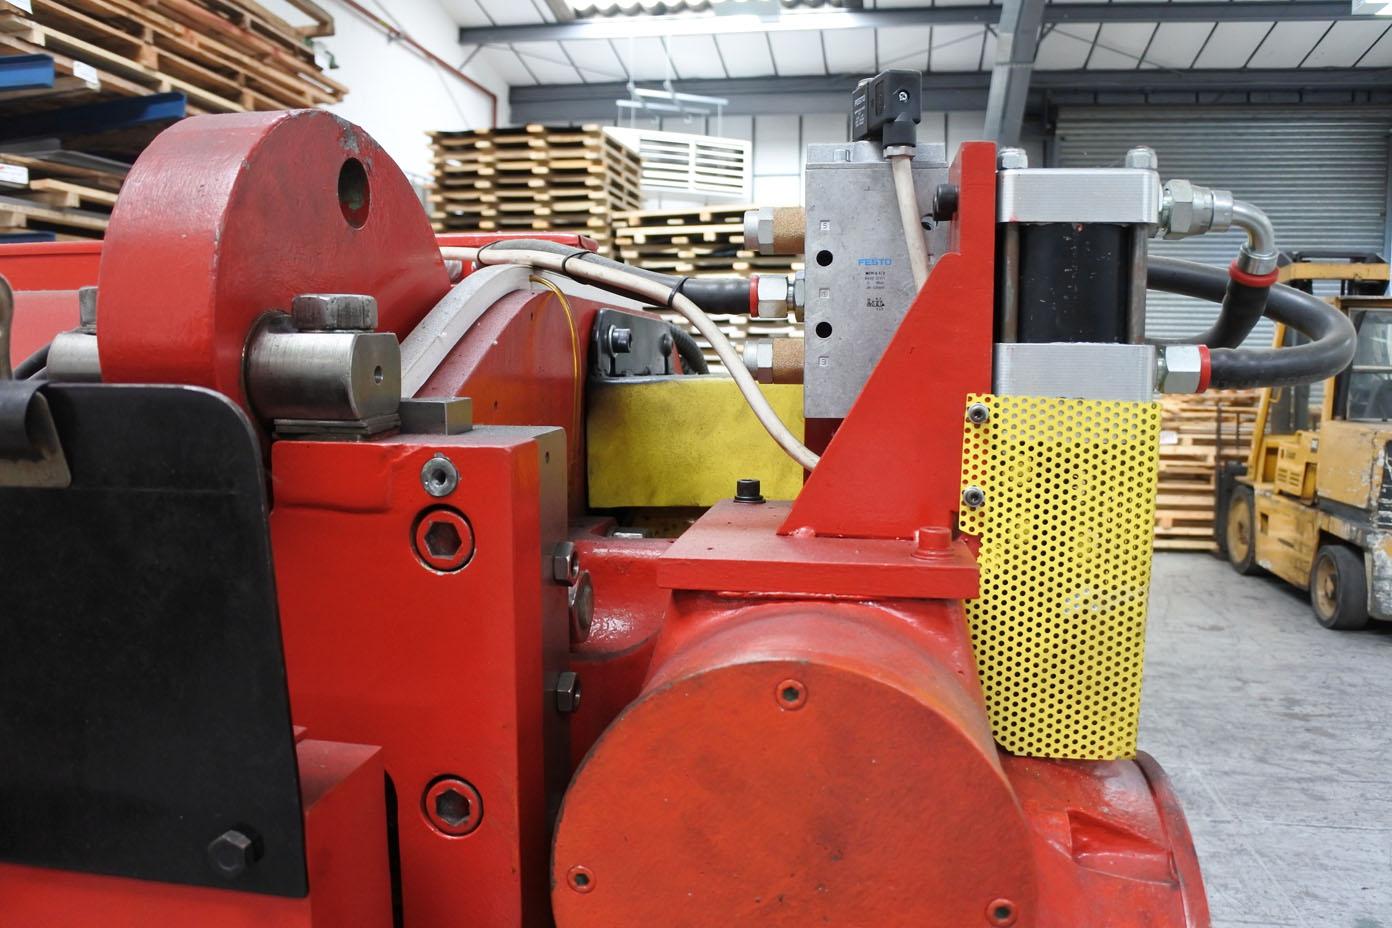 Used CINCINNATI 1012 Auto Shear. Capacity 12' x 10swg